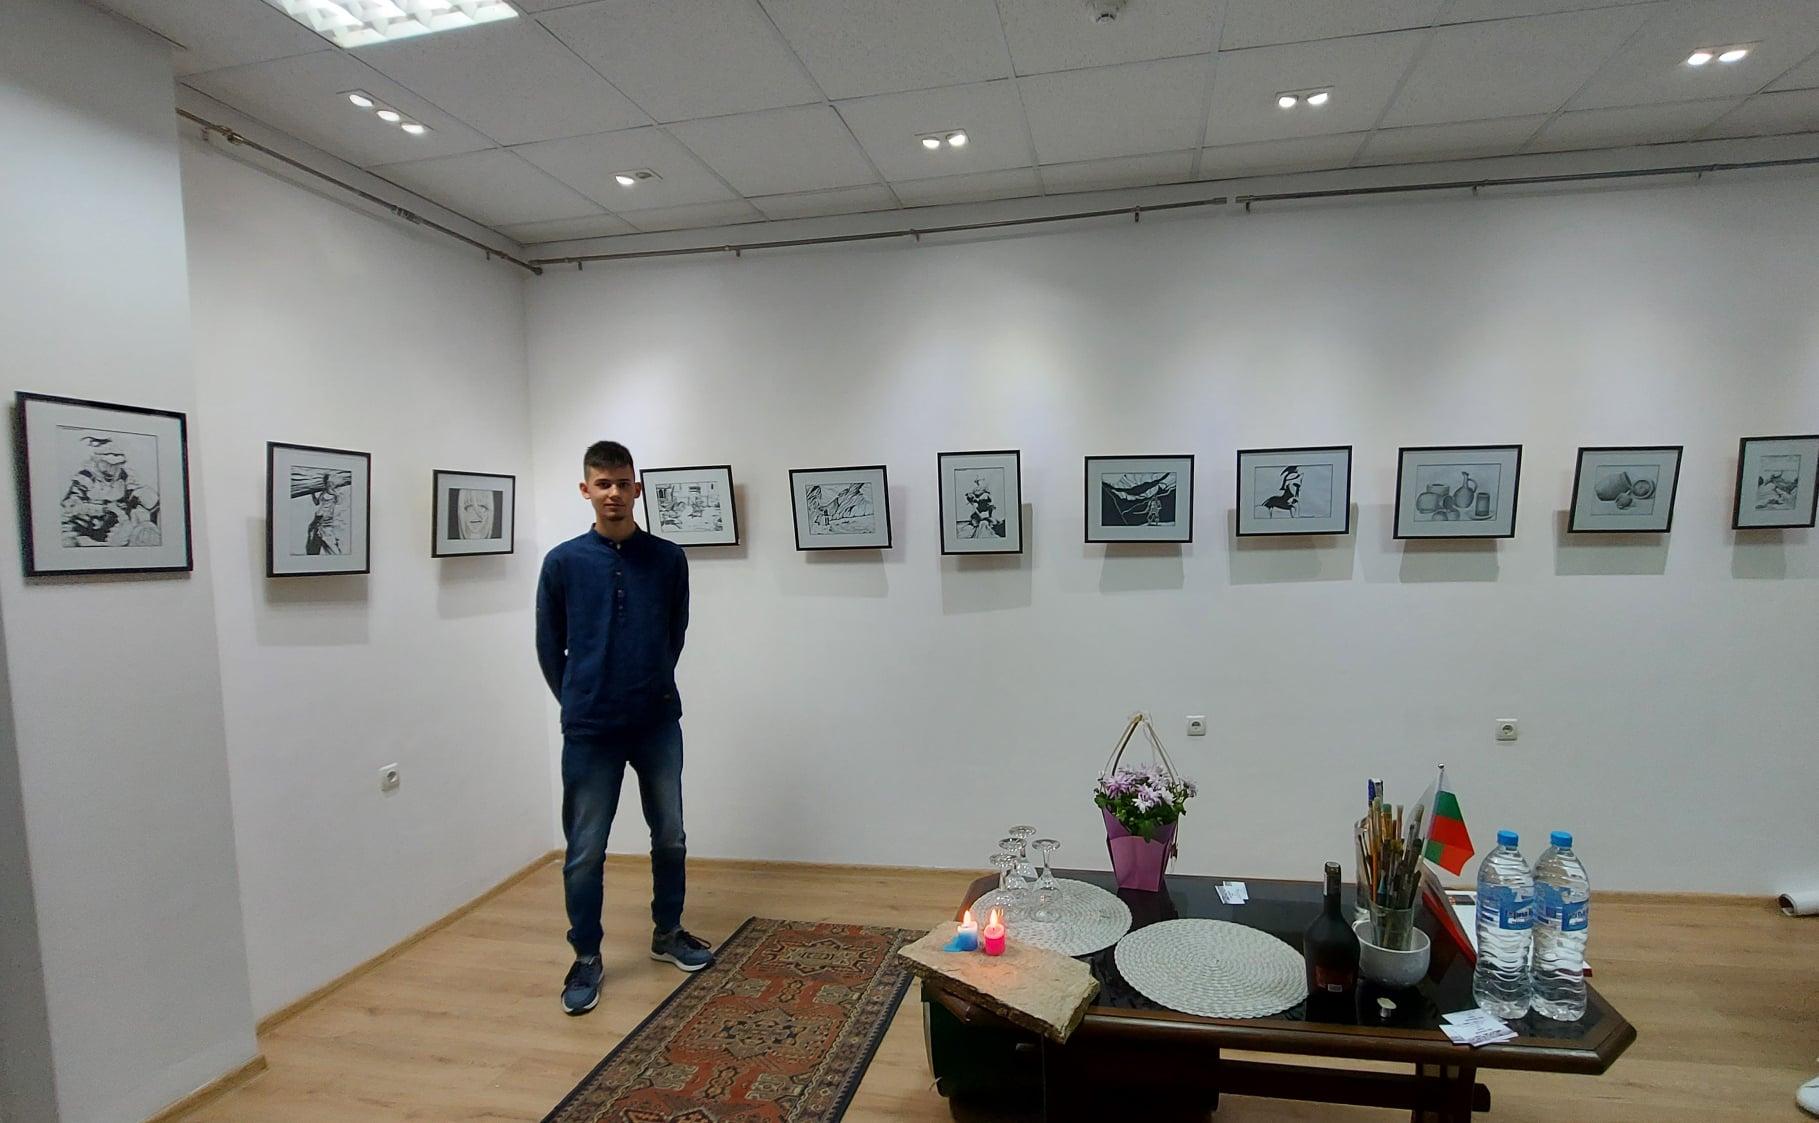 Десетокласникът Асен Бошнаков направи самостоятелна изложба в гр. Г. Делчев